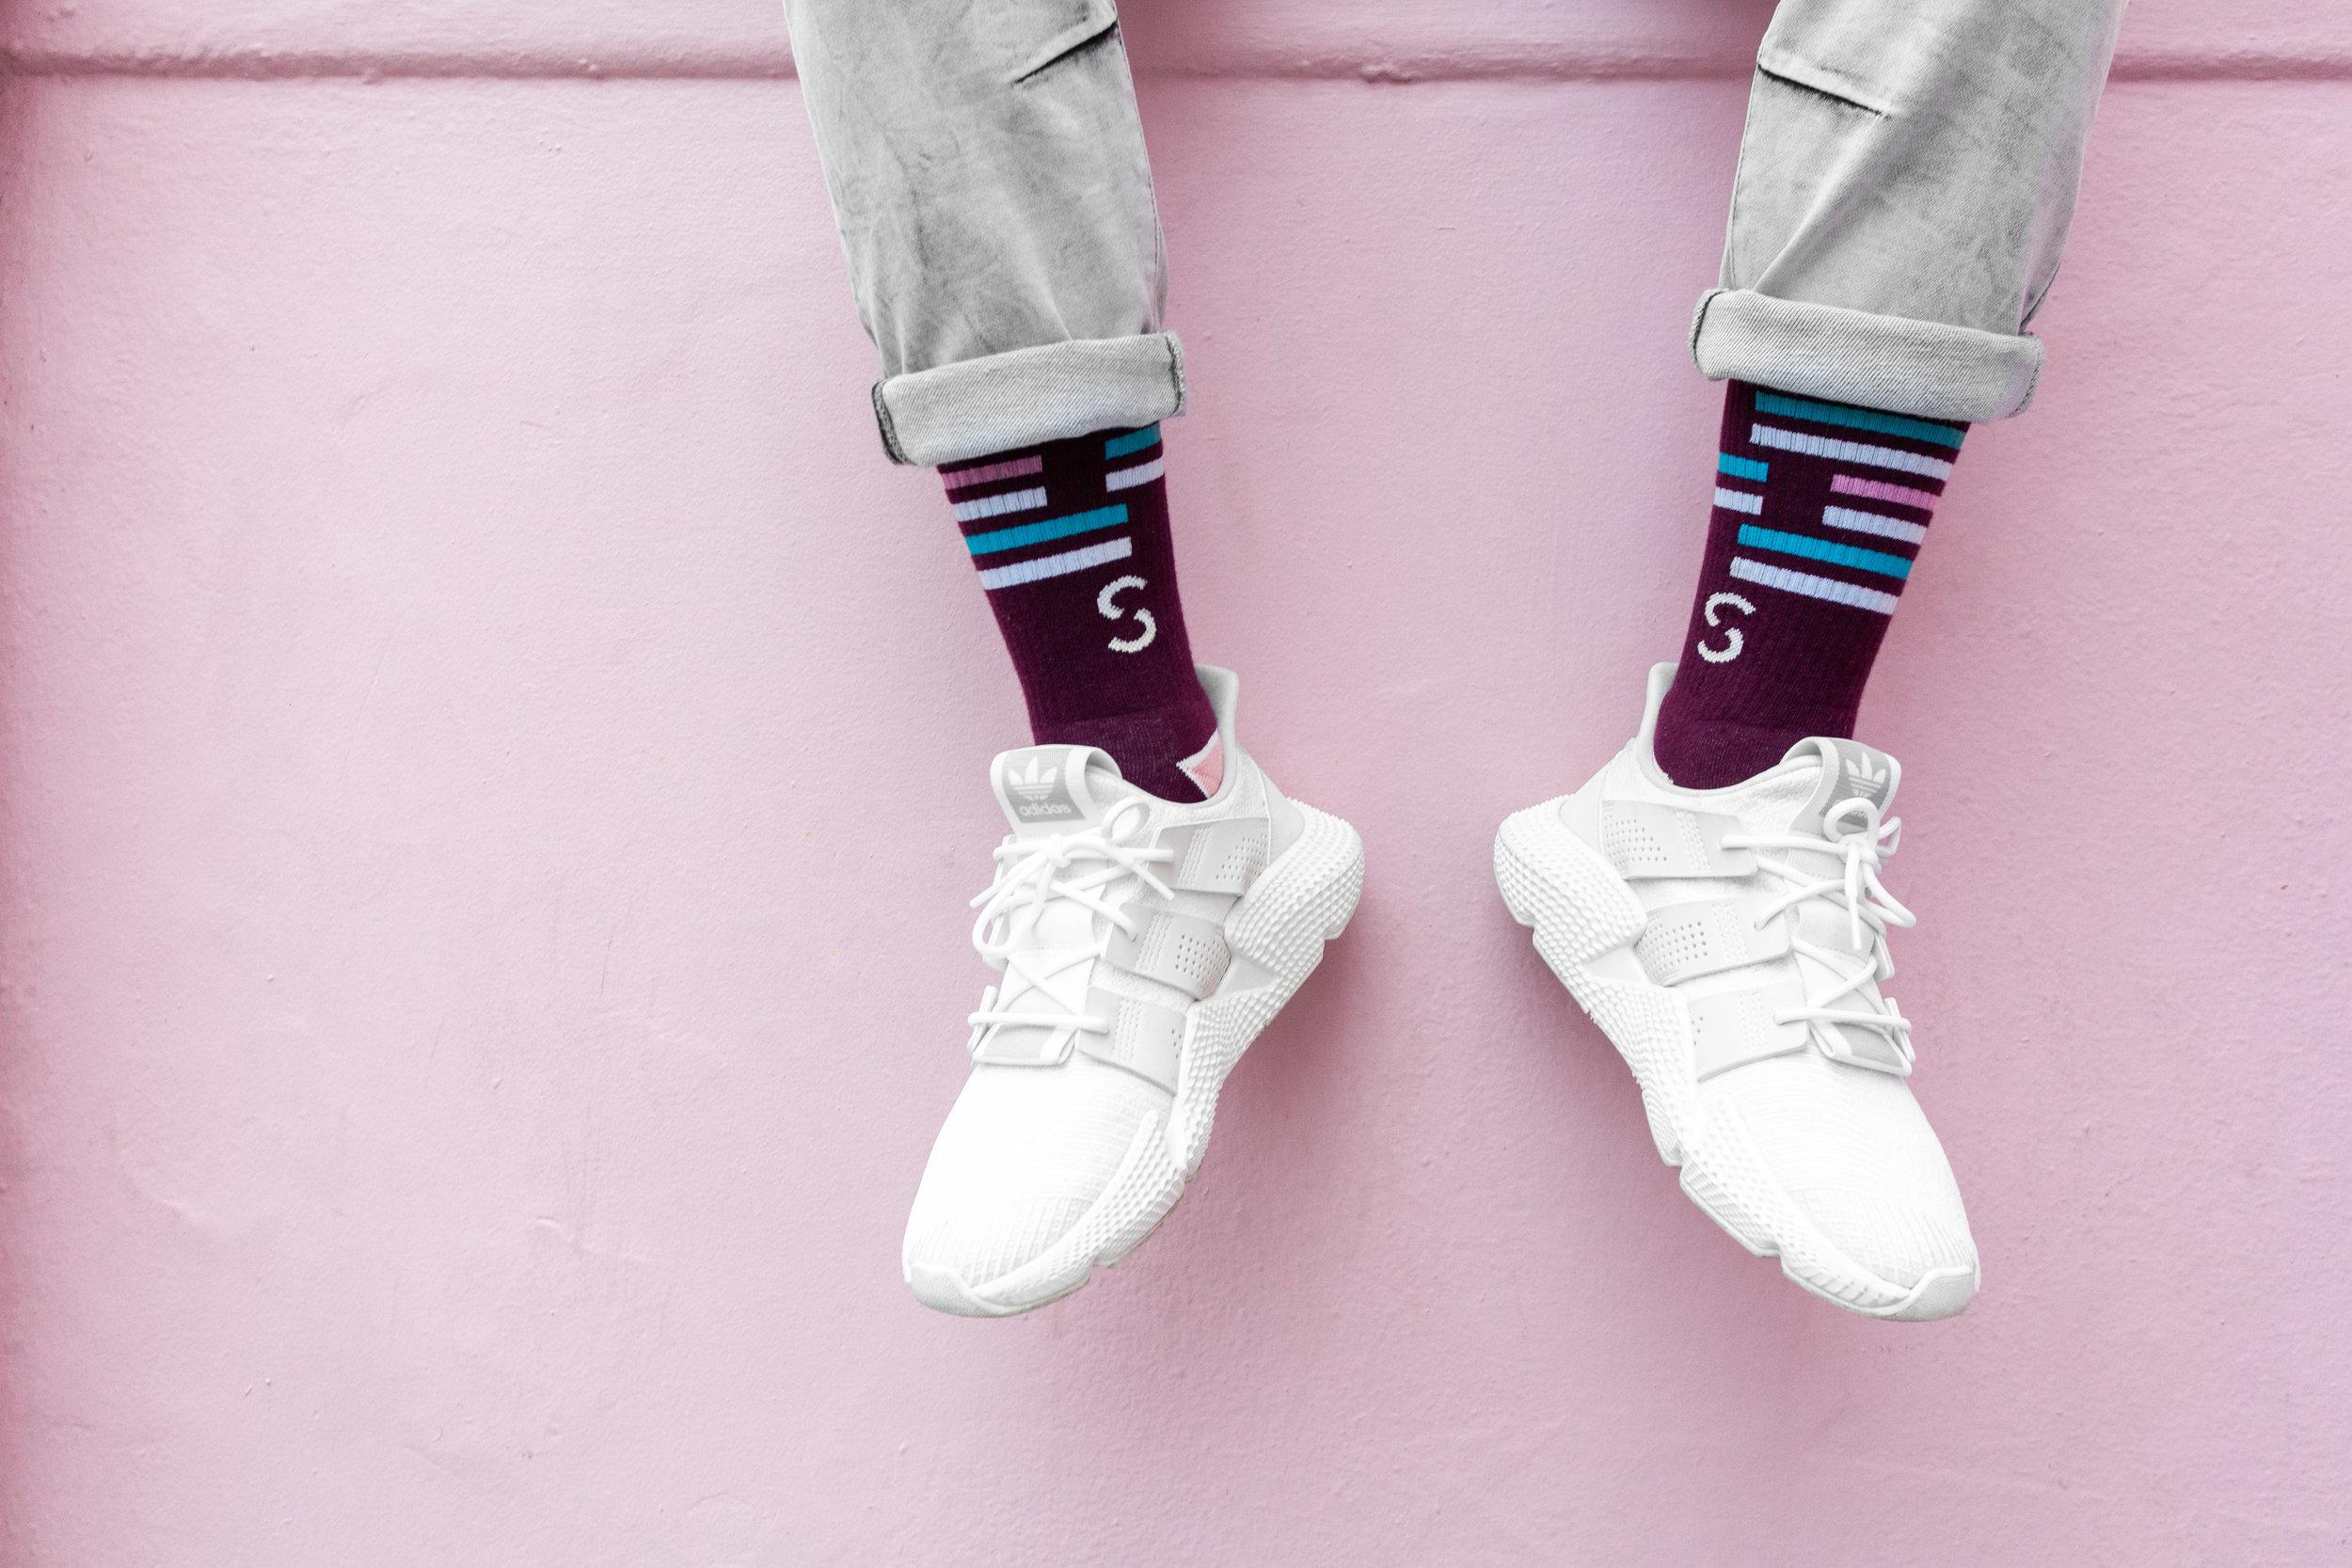 201906_Sexy Socks Active-12.jpg